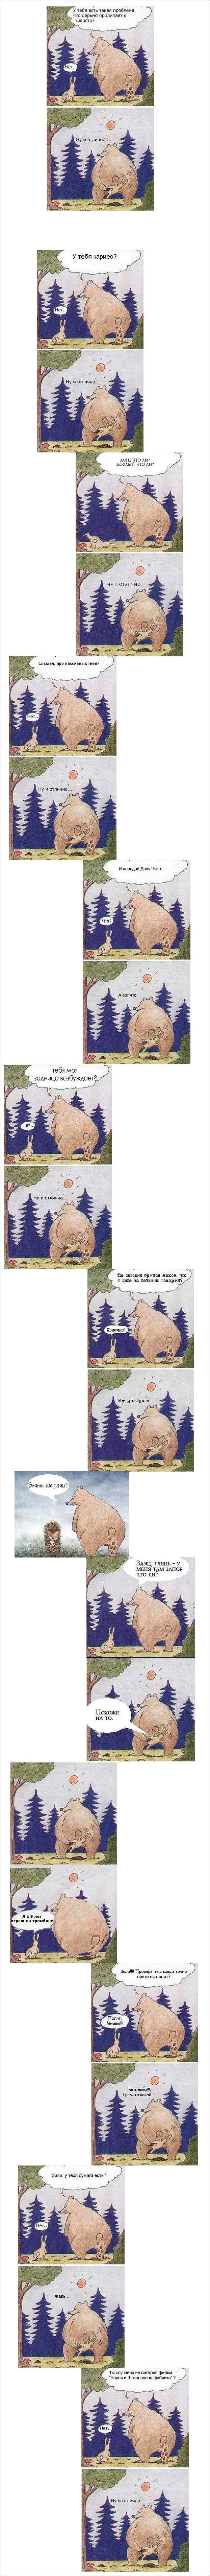 Медведь и заяц